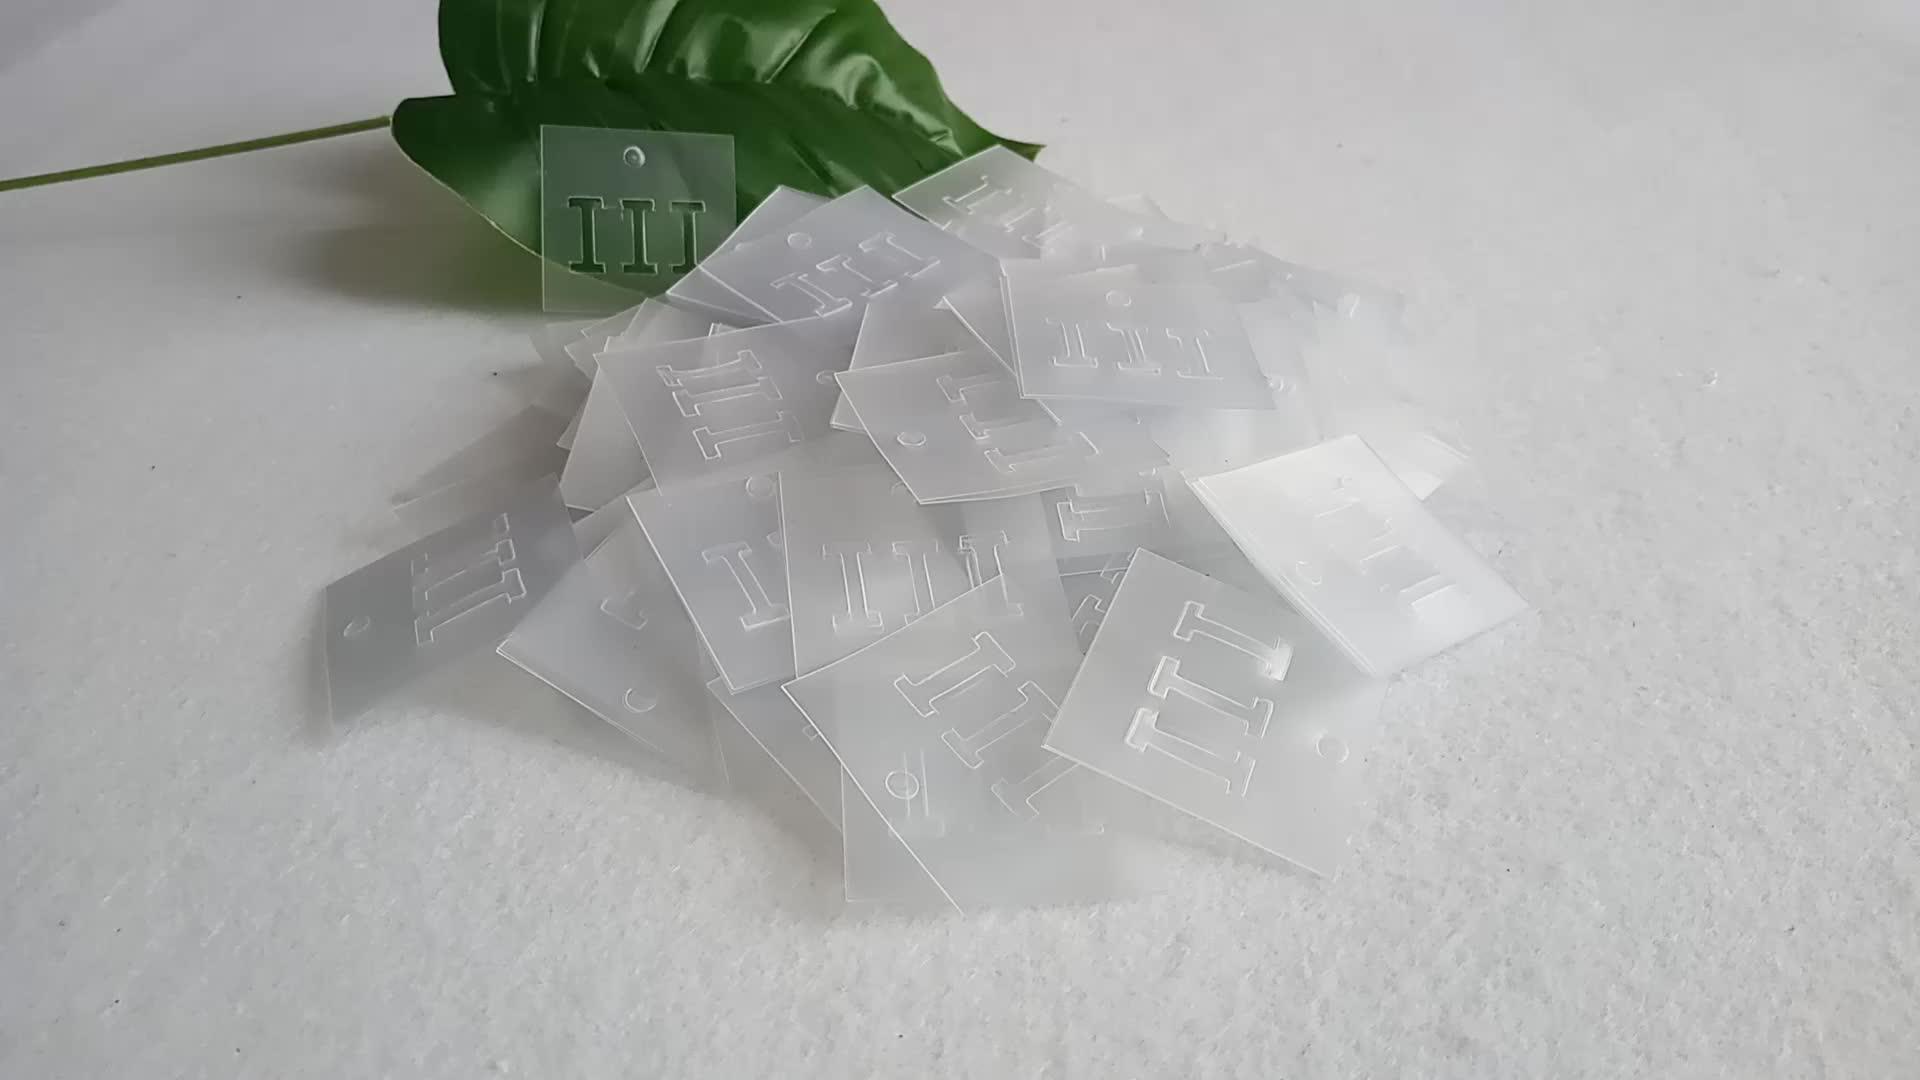 Luxus Individuelles Logo Tuch Klar Transparent PVC Kunststoff Hängen Tags